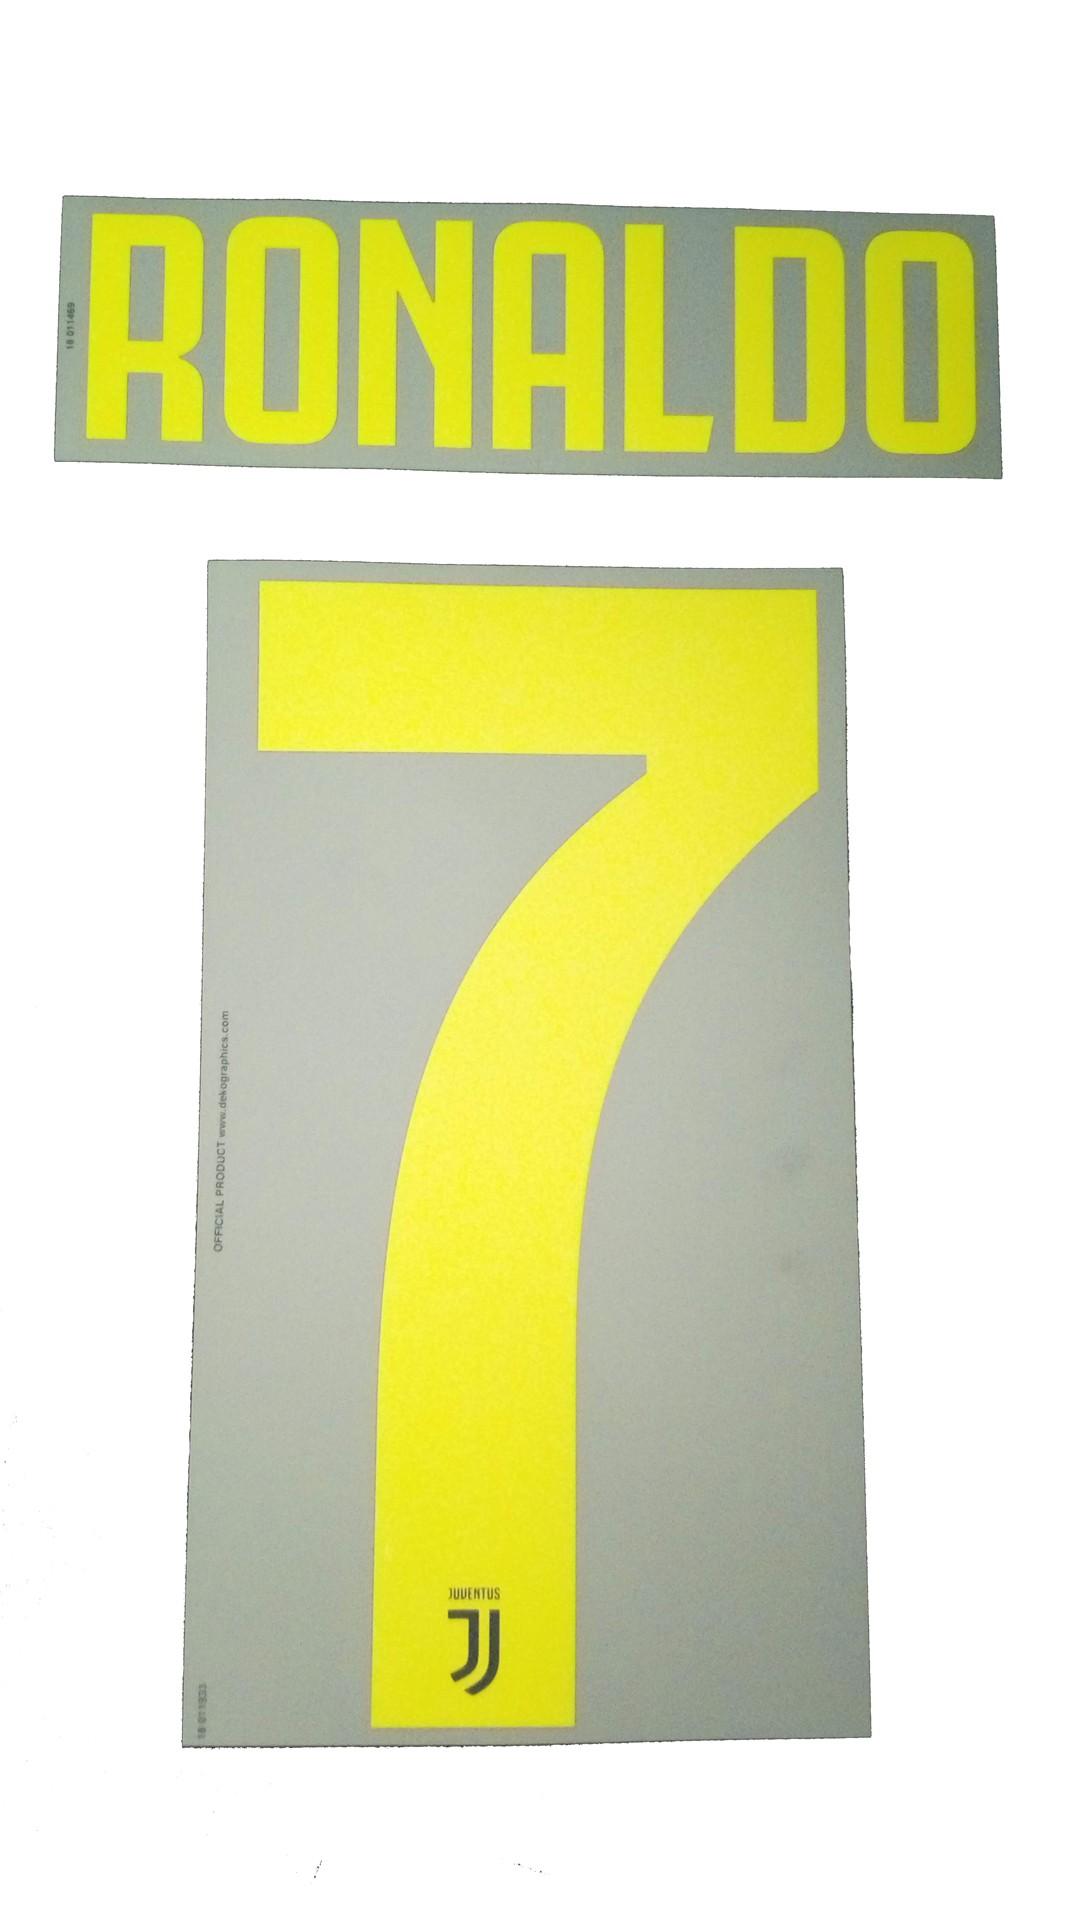 Juventus 7 Ronaldo name and number home shirt dfa683cbdc897